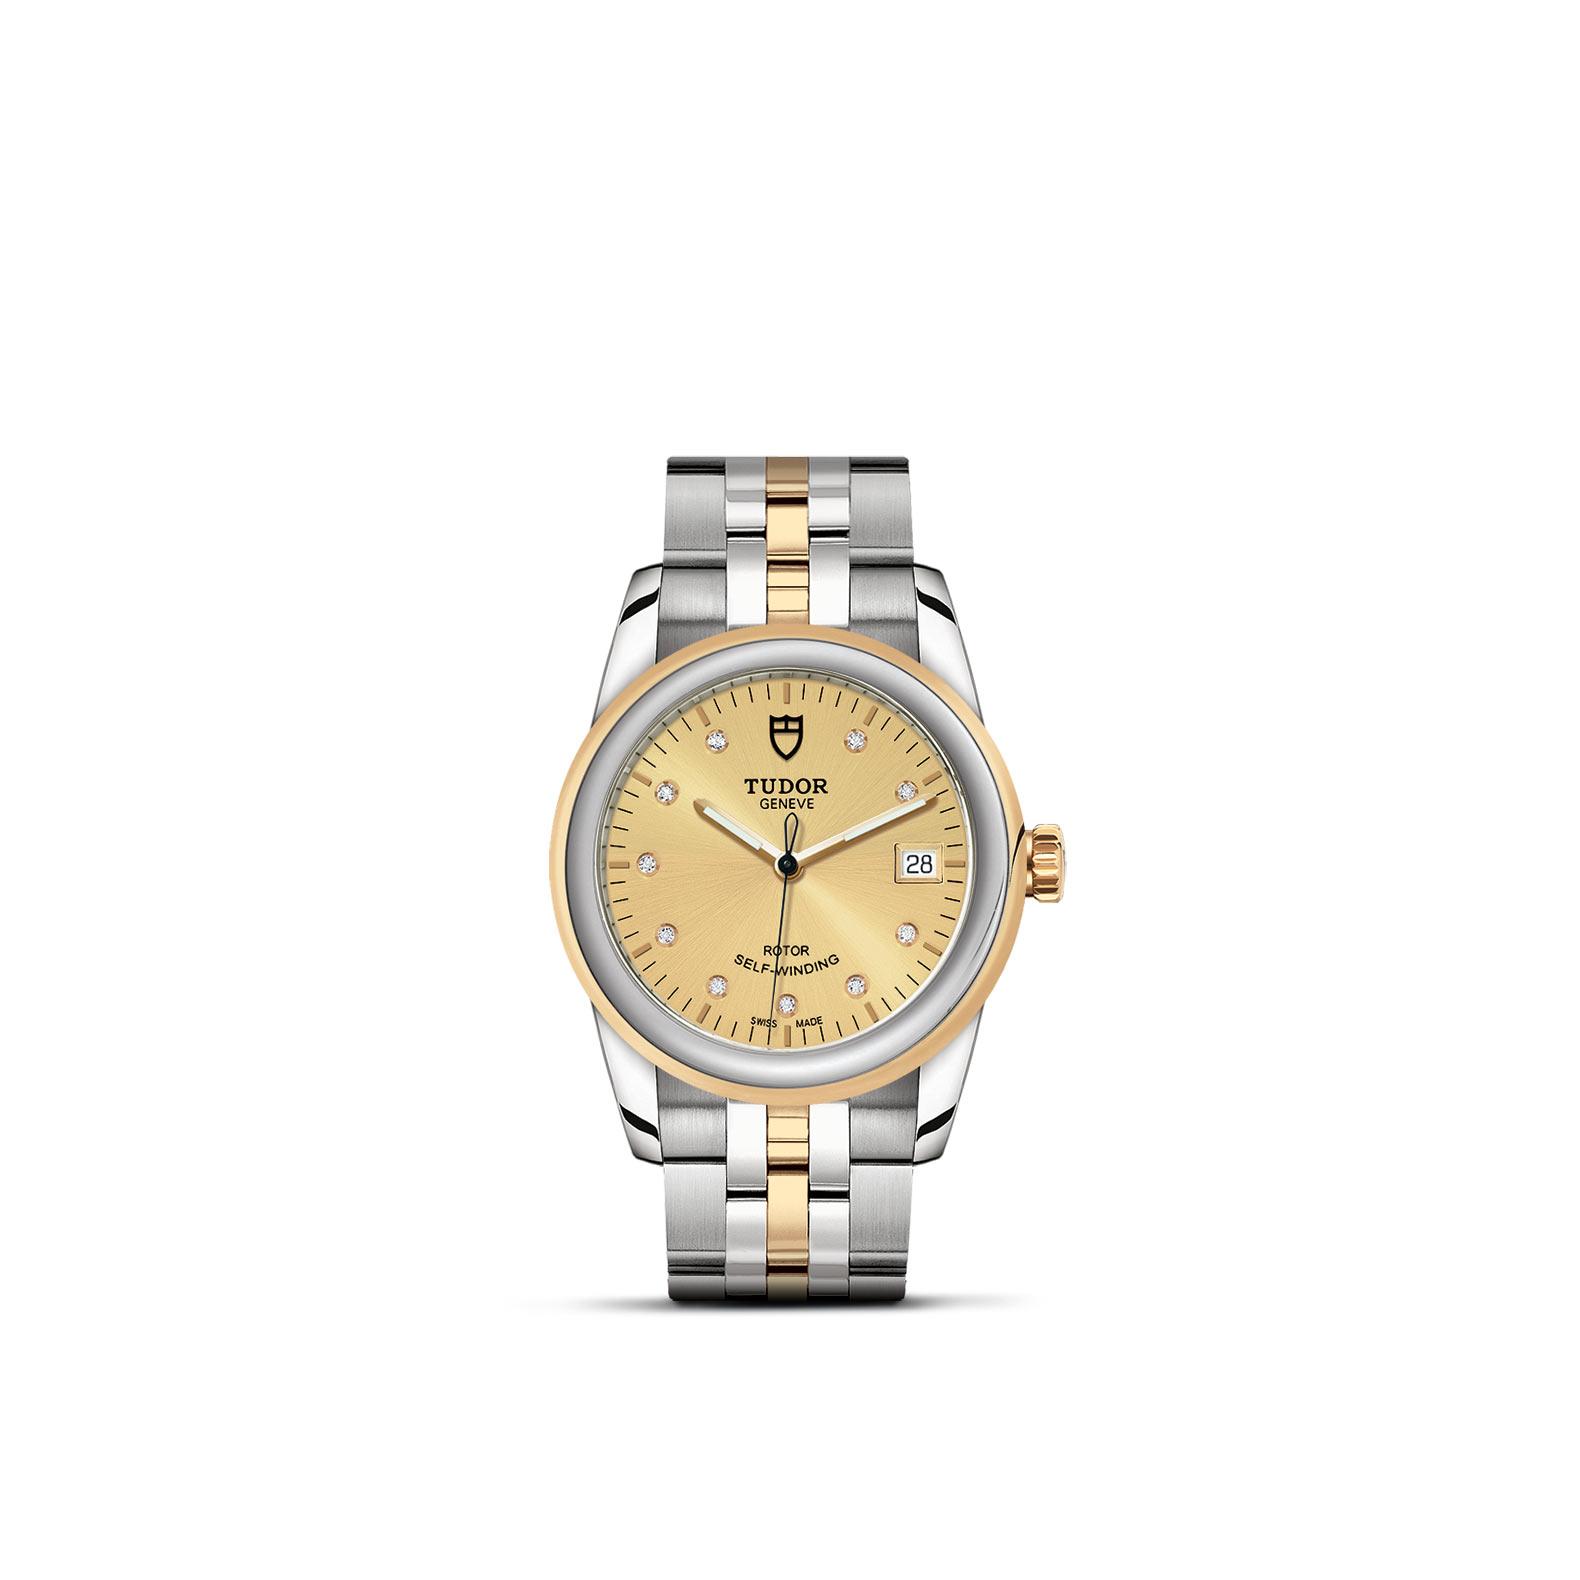 TUDOR Glamour Date M55003 0006 Upright